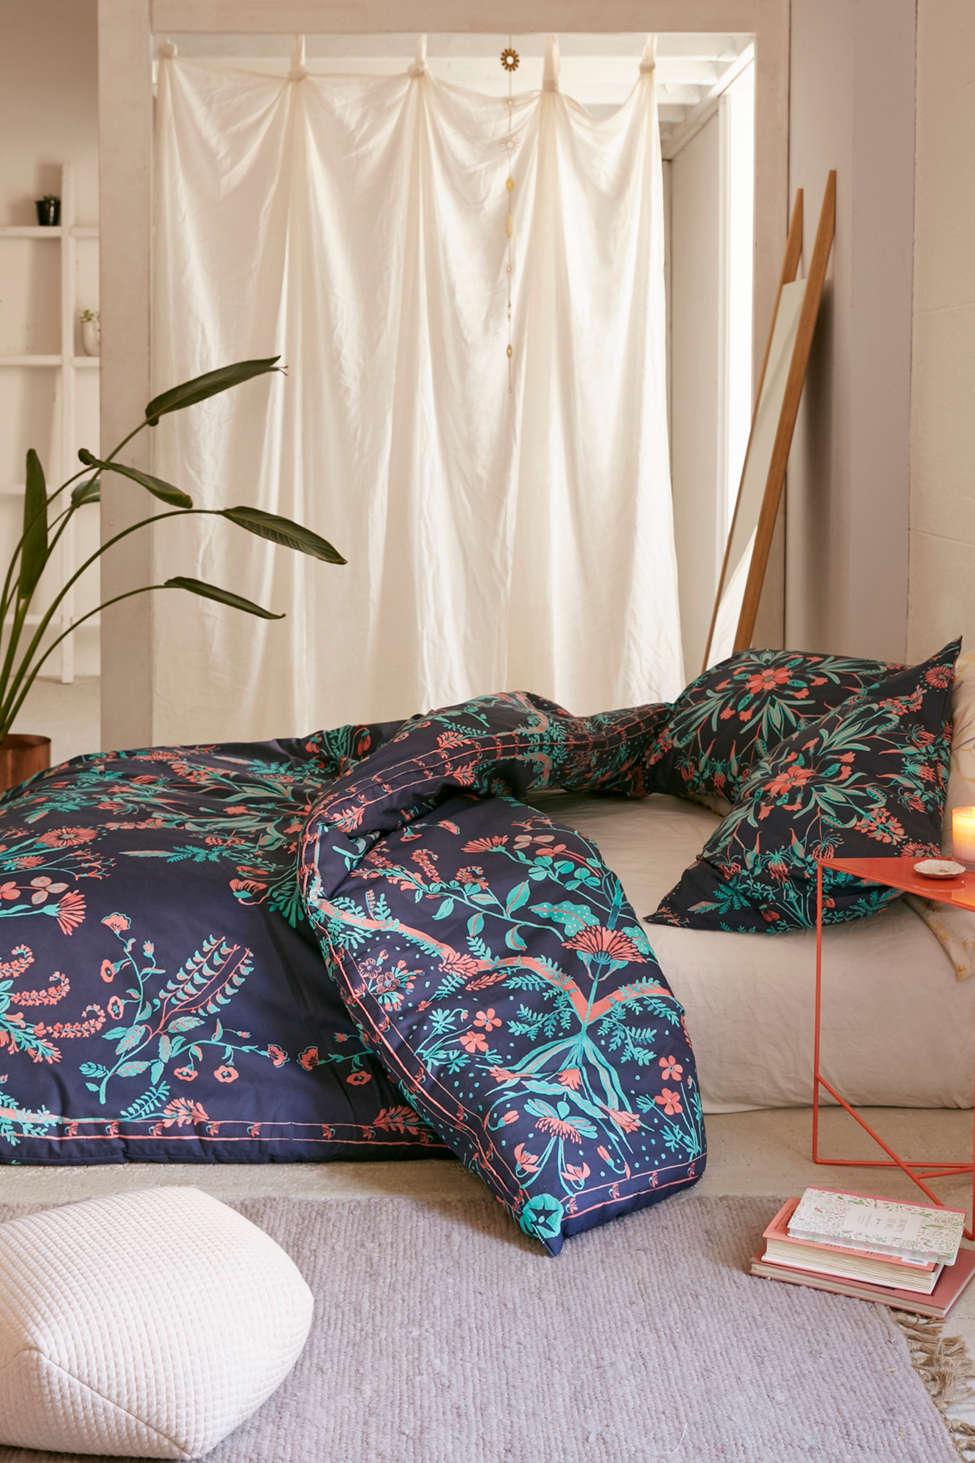 Slide View: 1: Bettina Floral Comforter